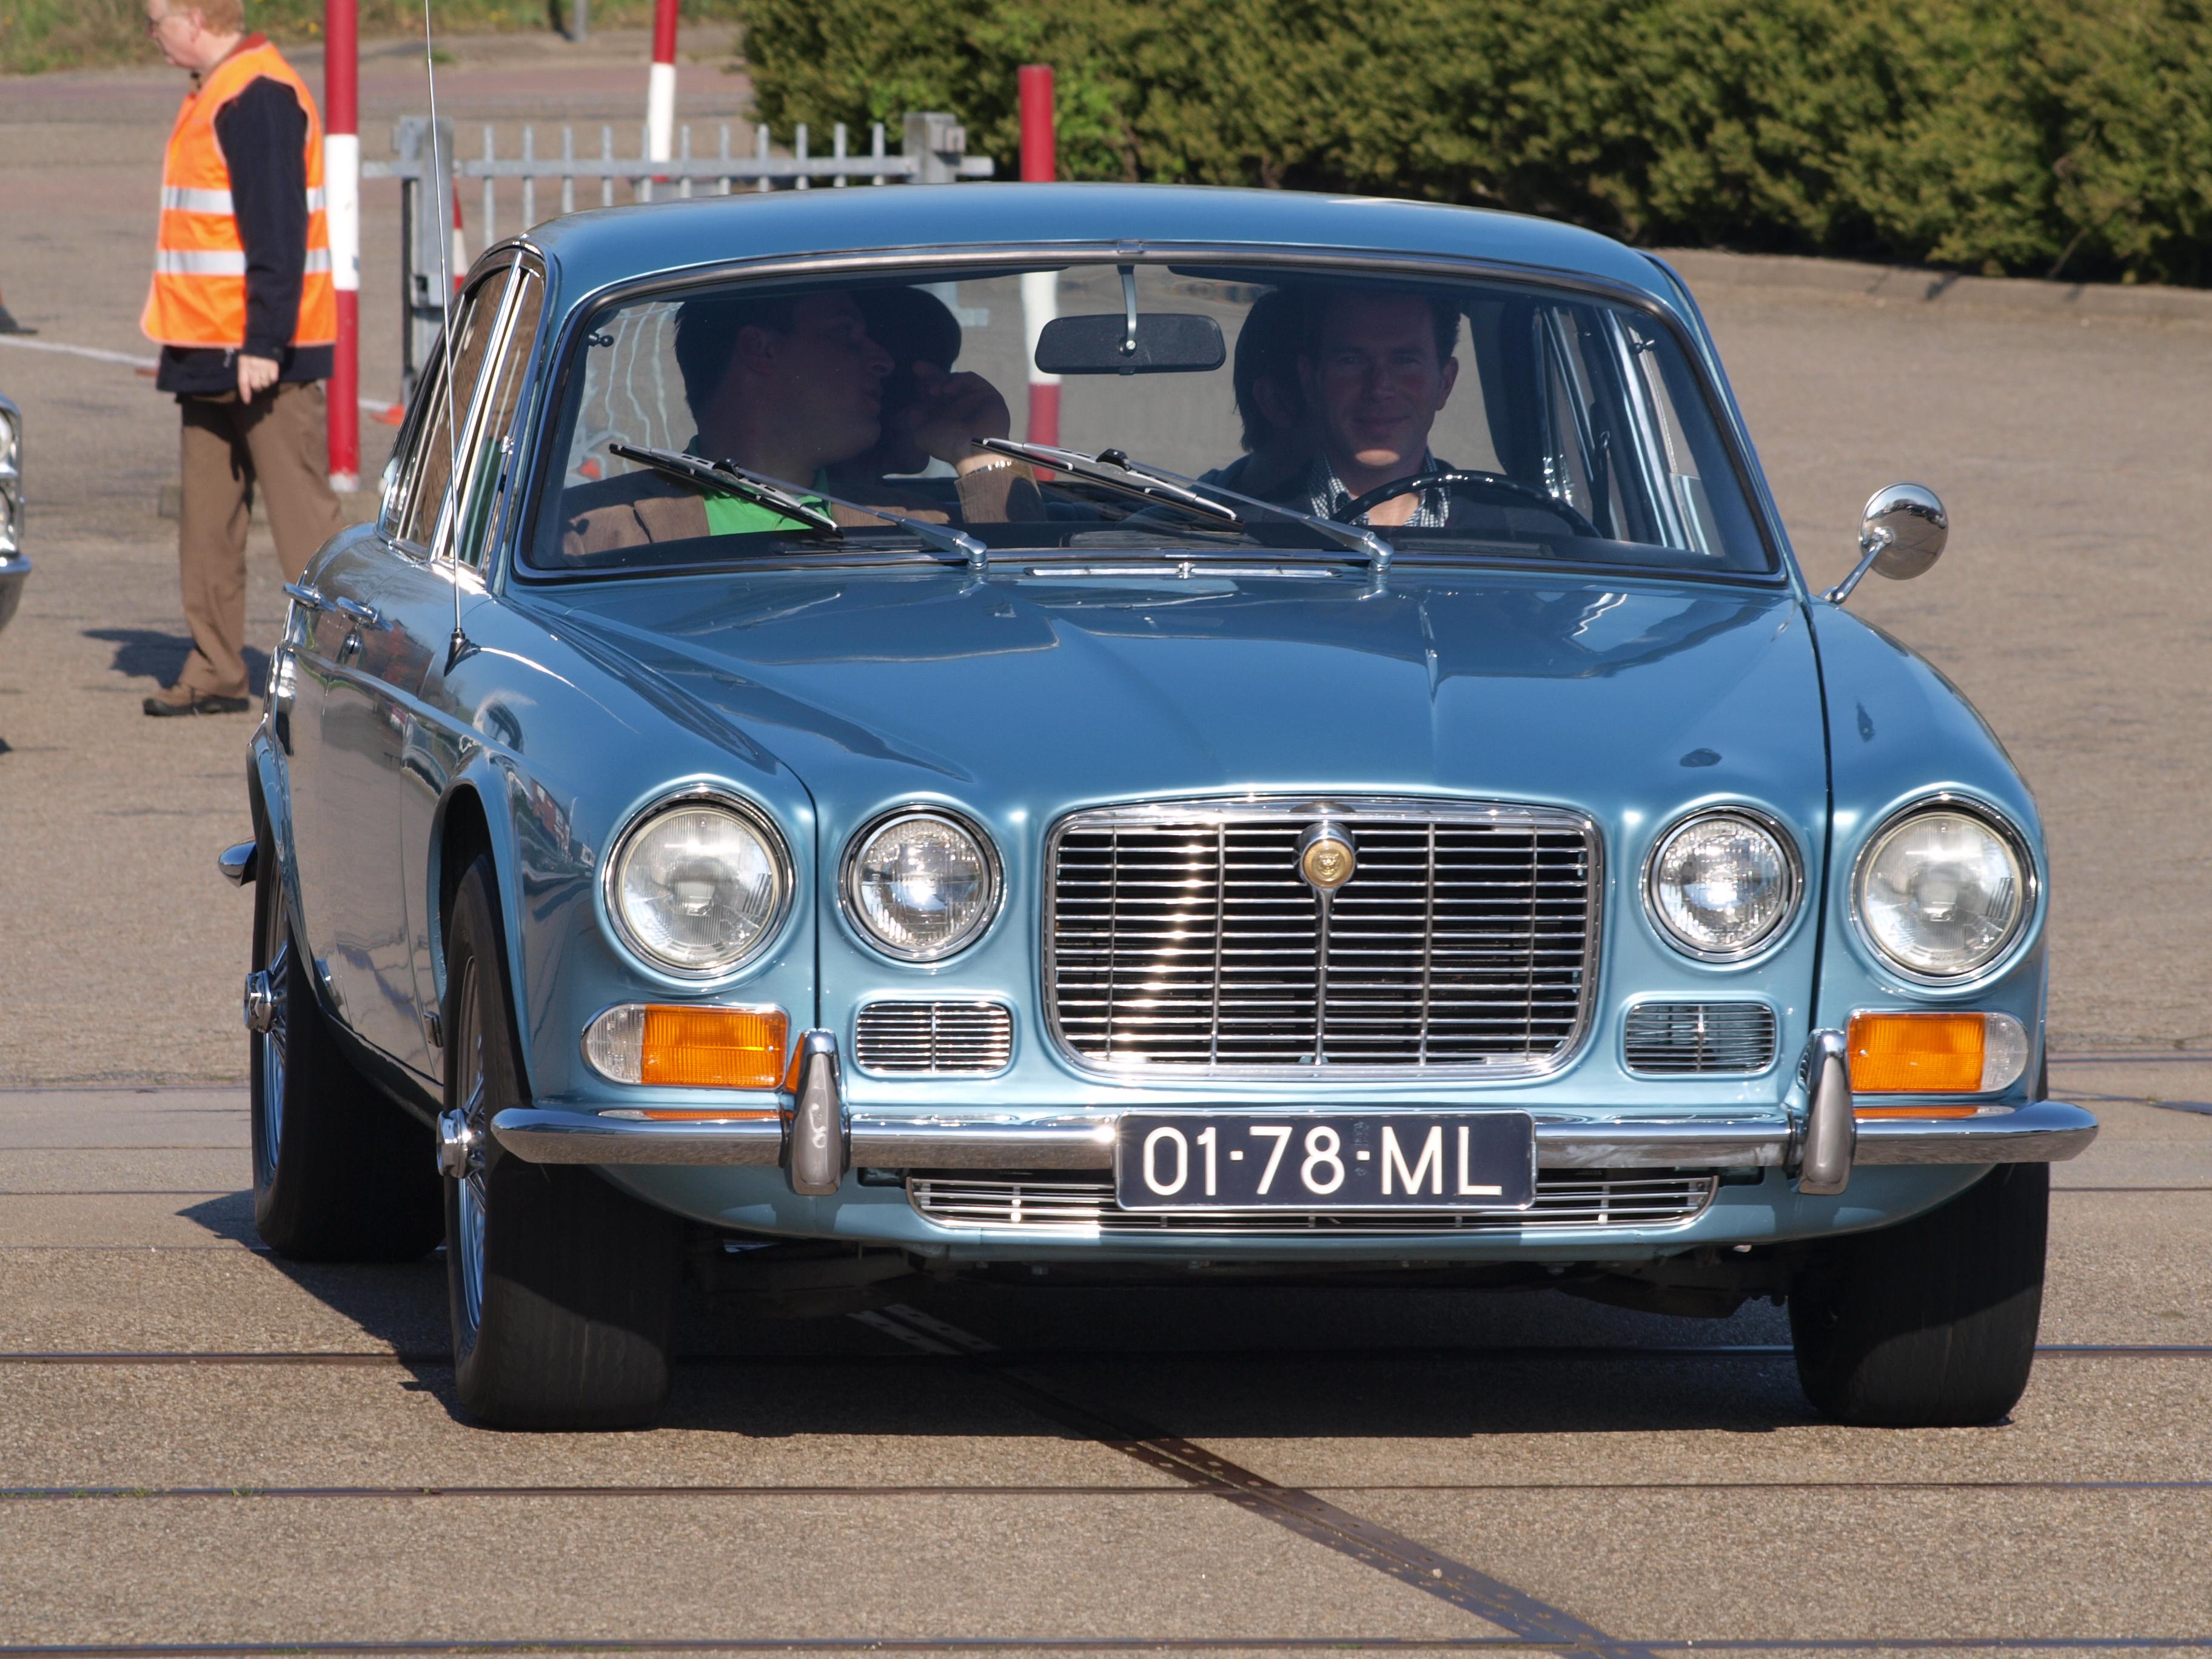 File:Jaguar XJ6-4.2 (1970), Dutch licecence registration ...